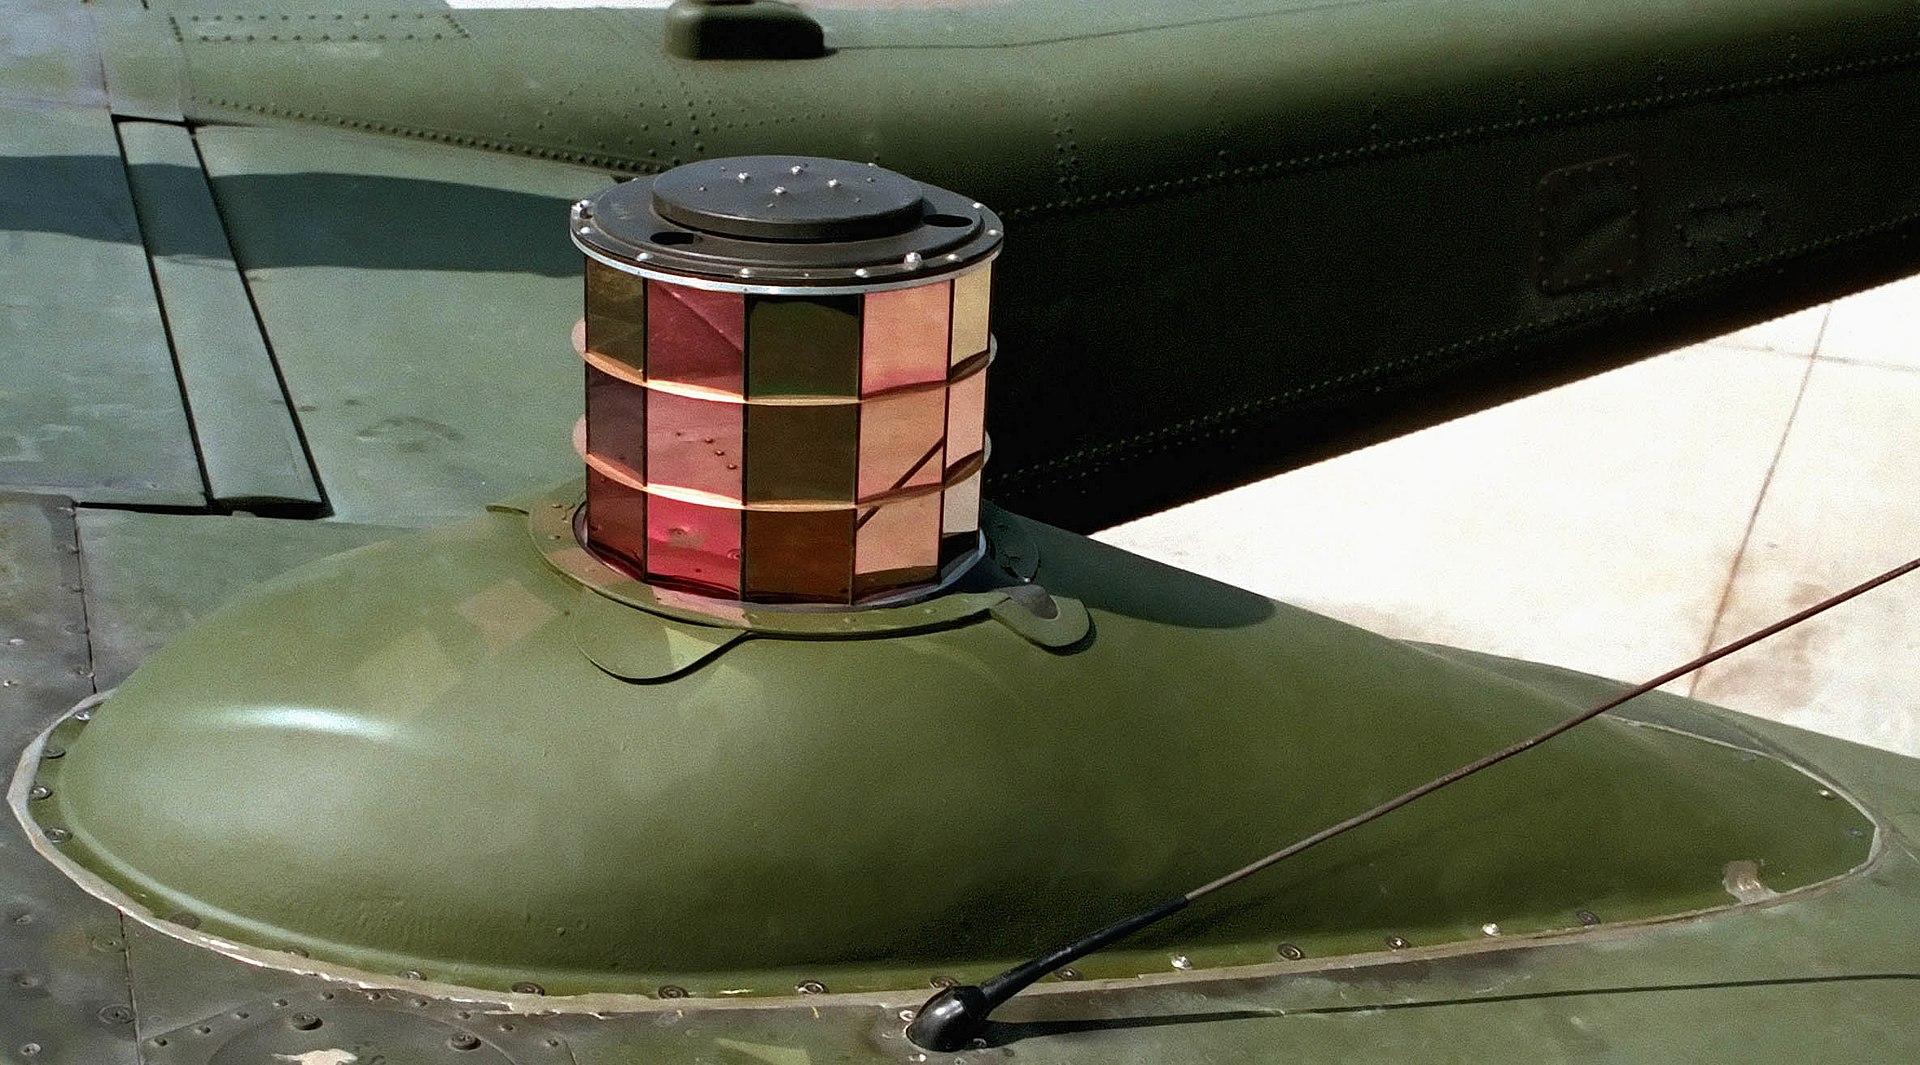 1920px-ALQ-144_IRCM.jpg